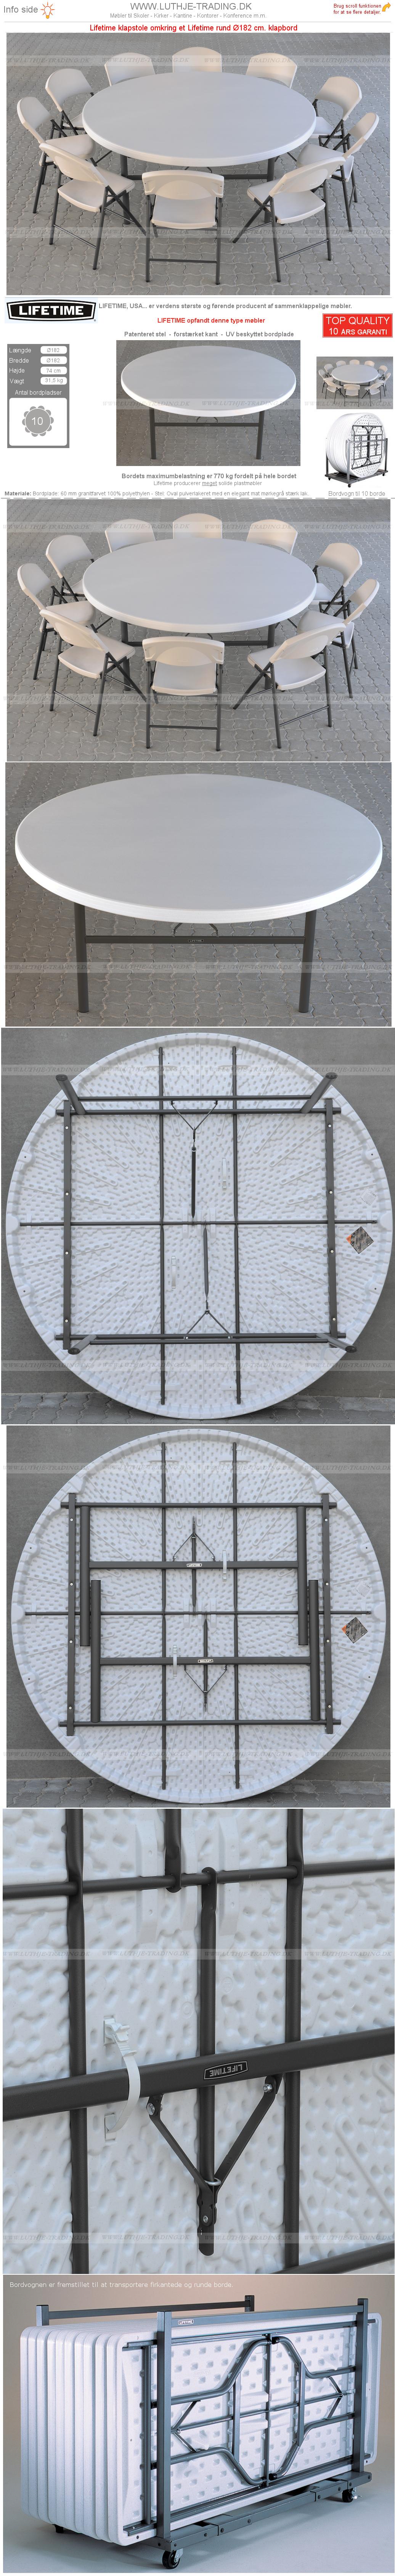 Plast klapborde opstilling 11